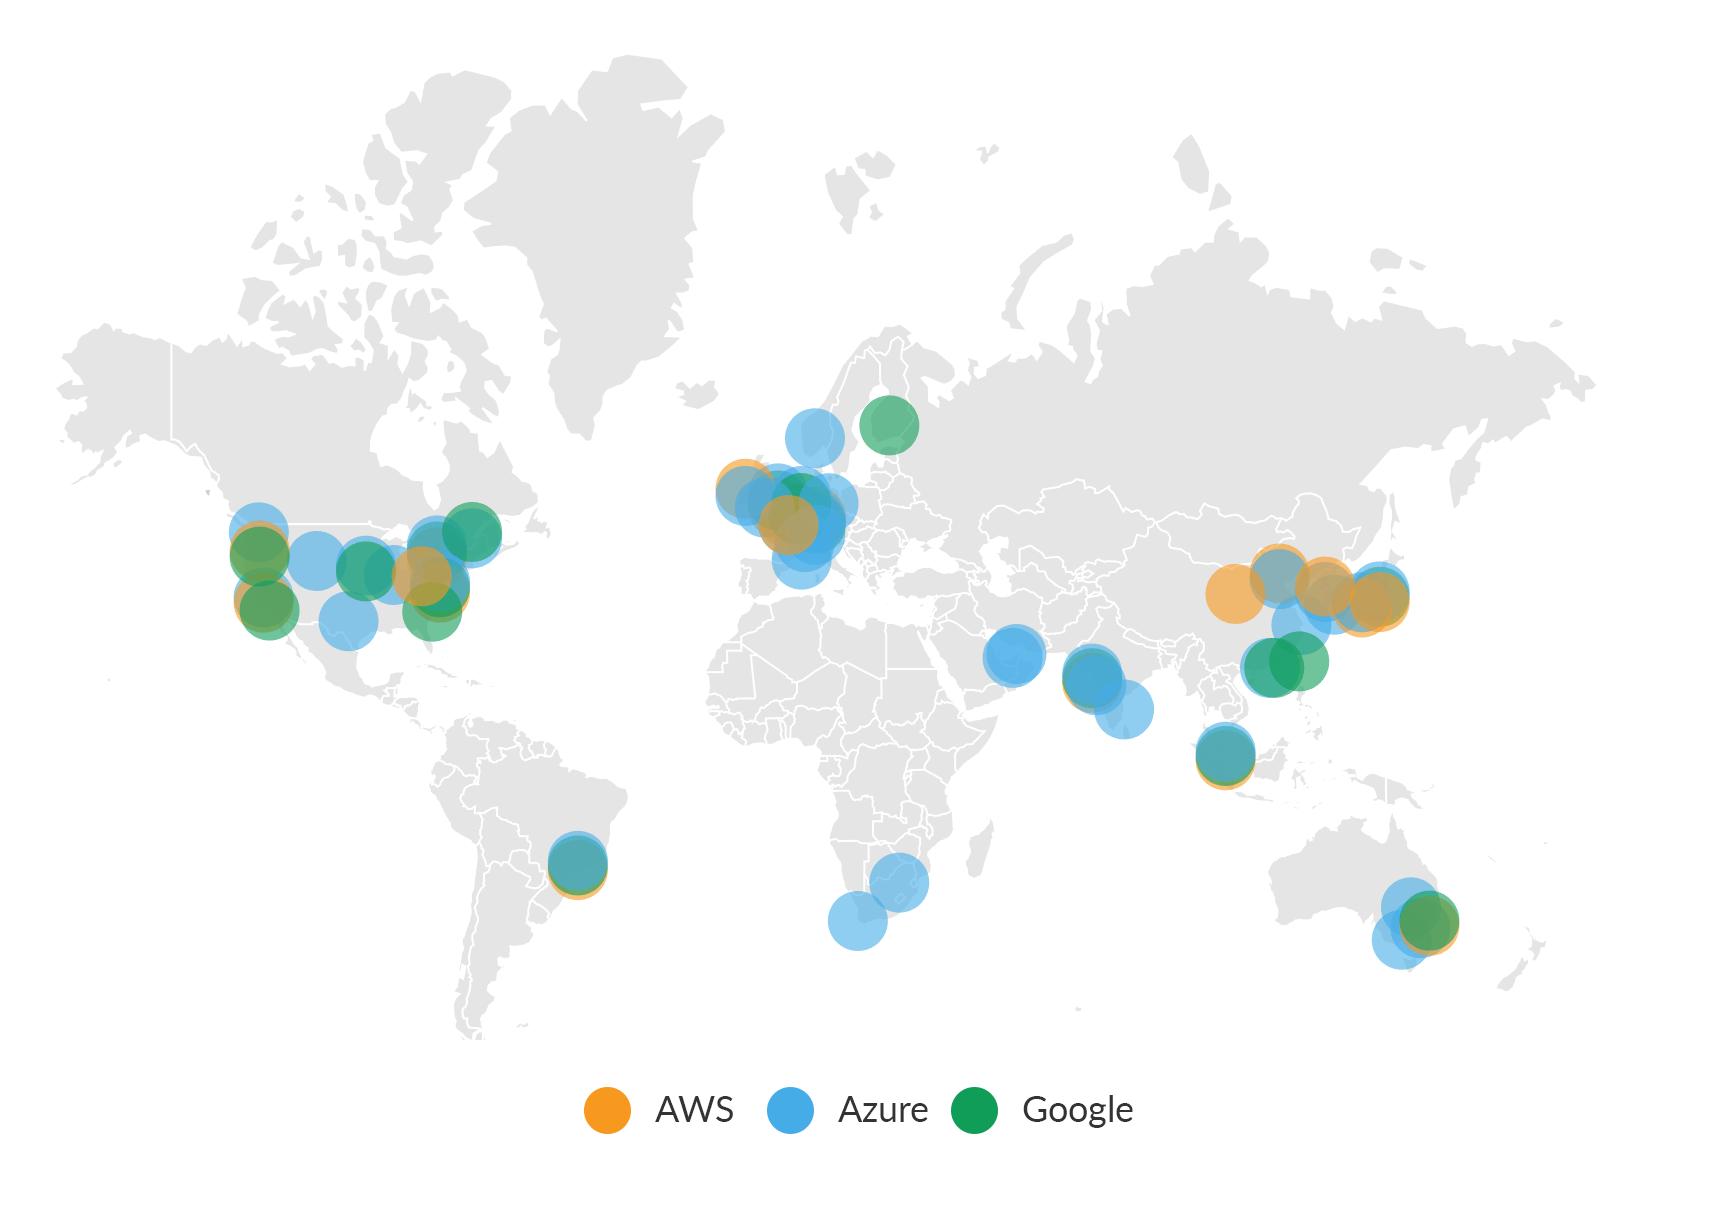 Choosing the Best Cloud Solution: Amazon Web Services vs Microsoft